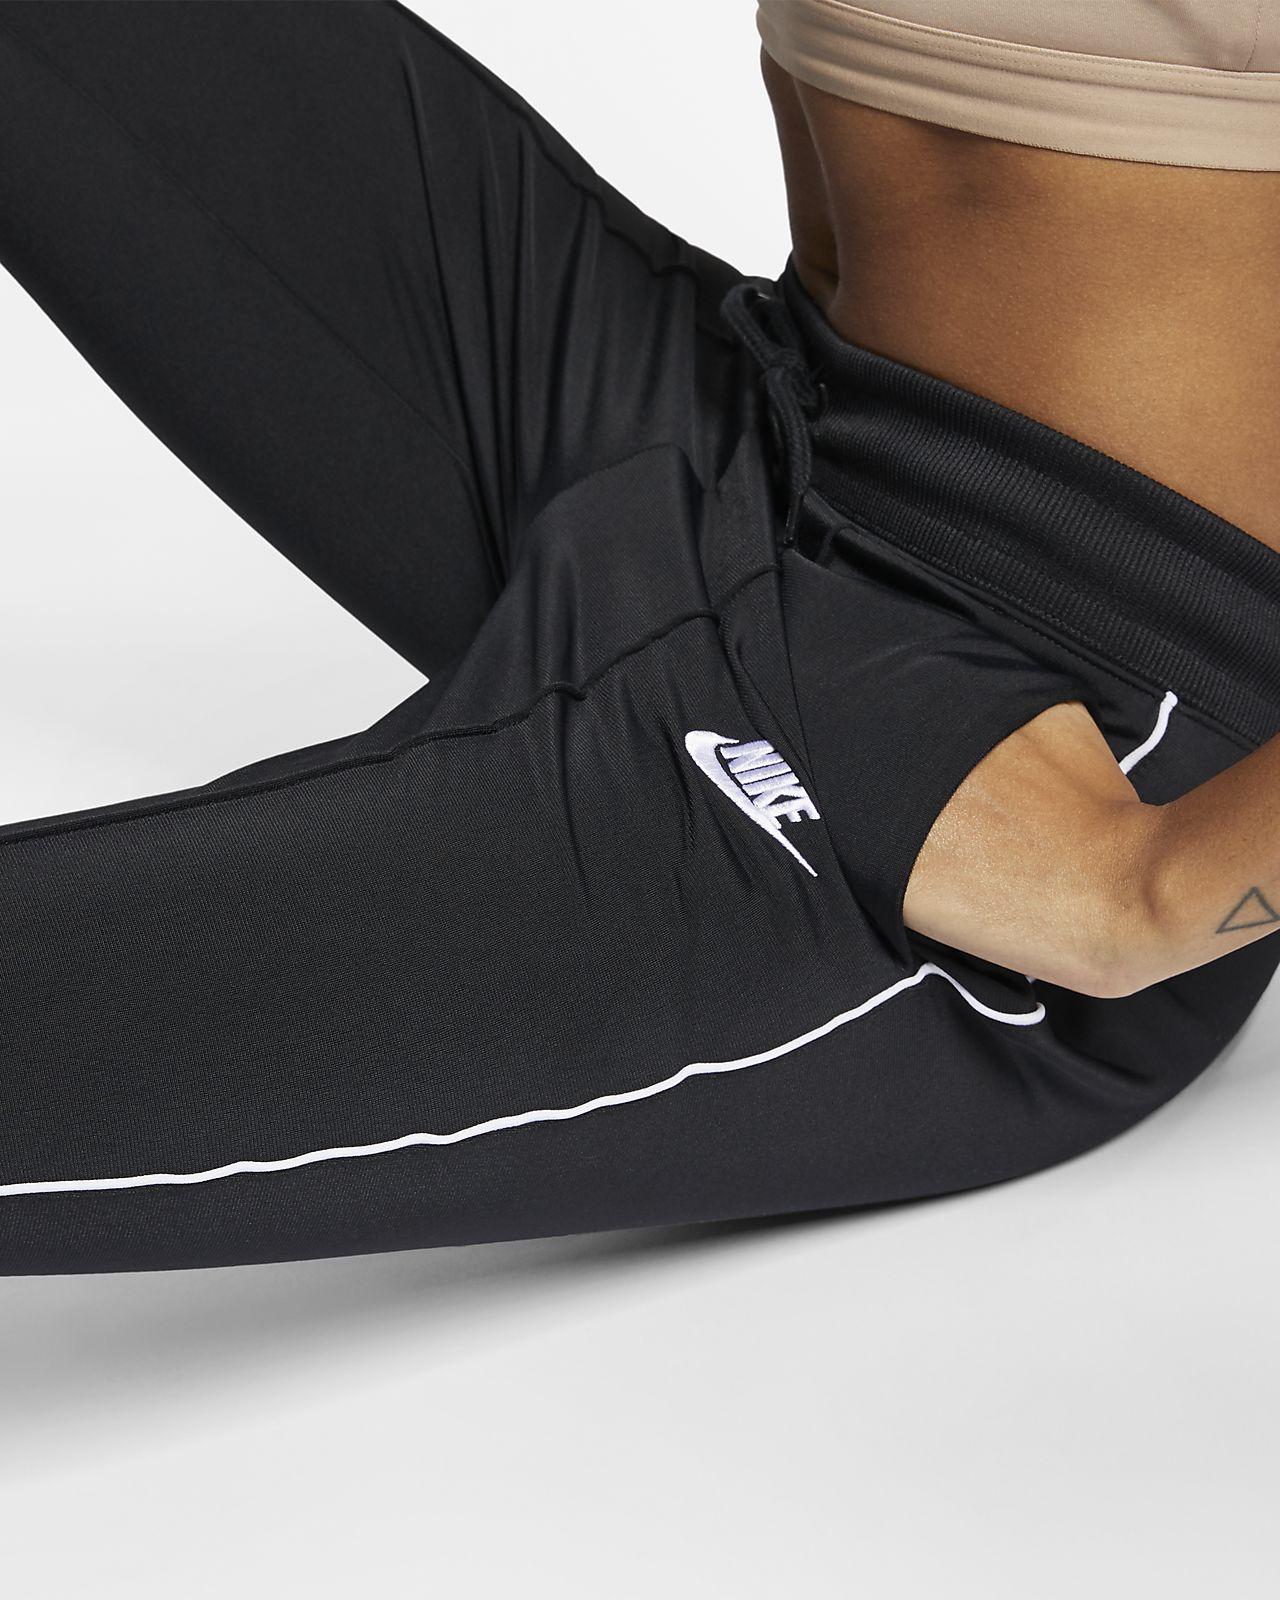 b15ca1492853 Nike Sportswear Heritage Women s Slim Pants. Nike.com